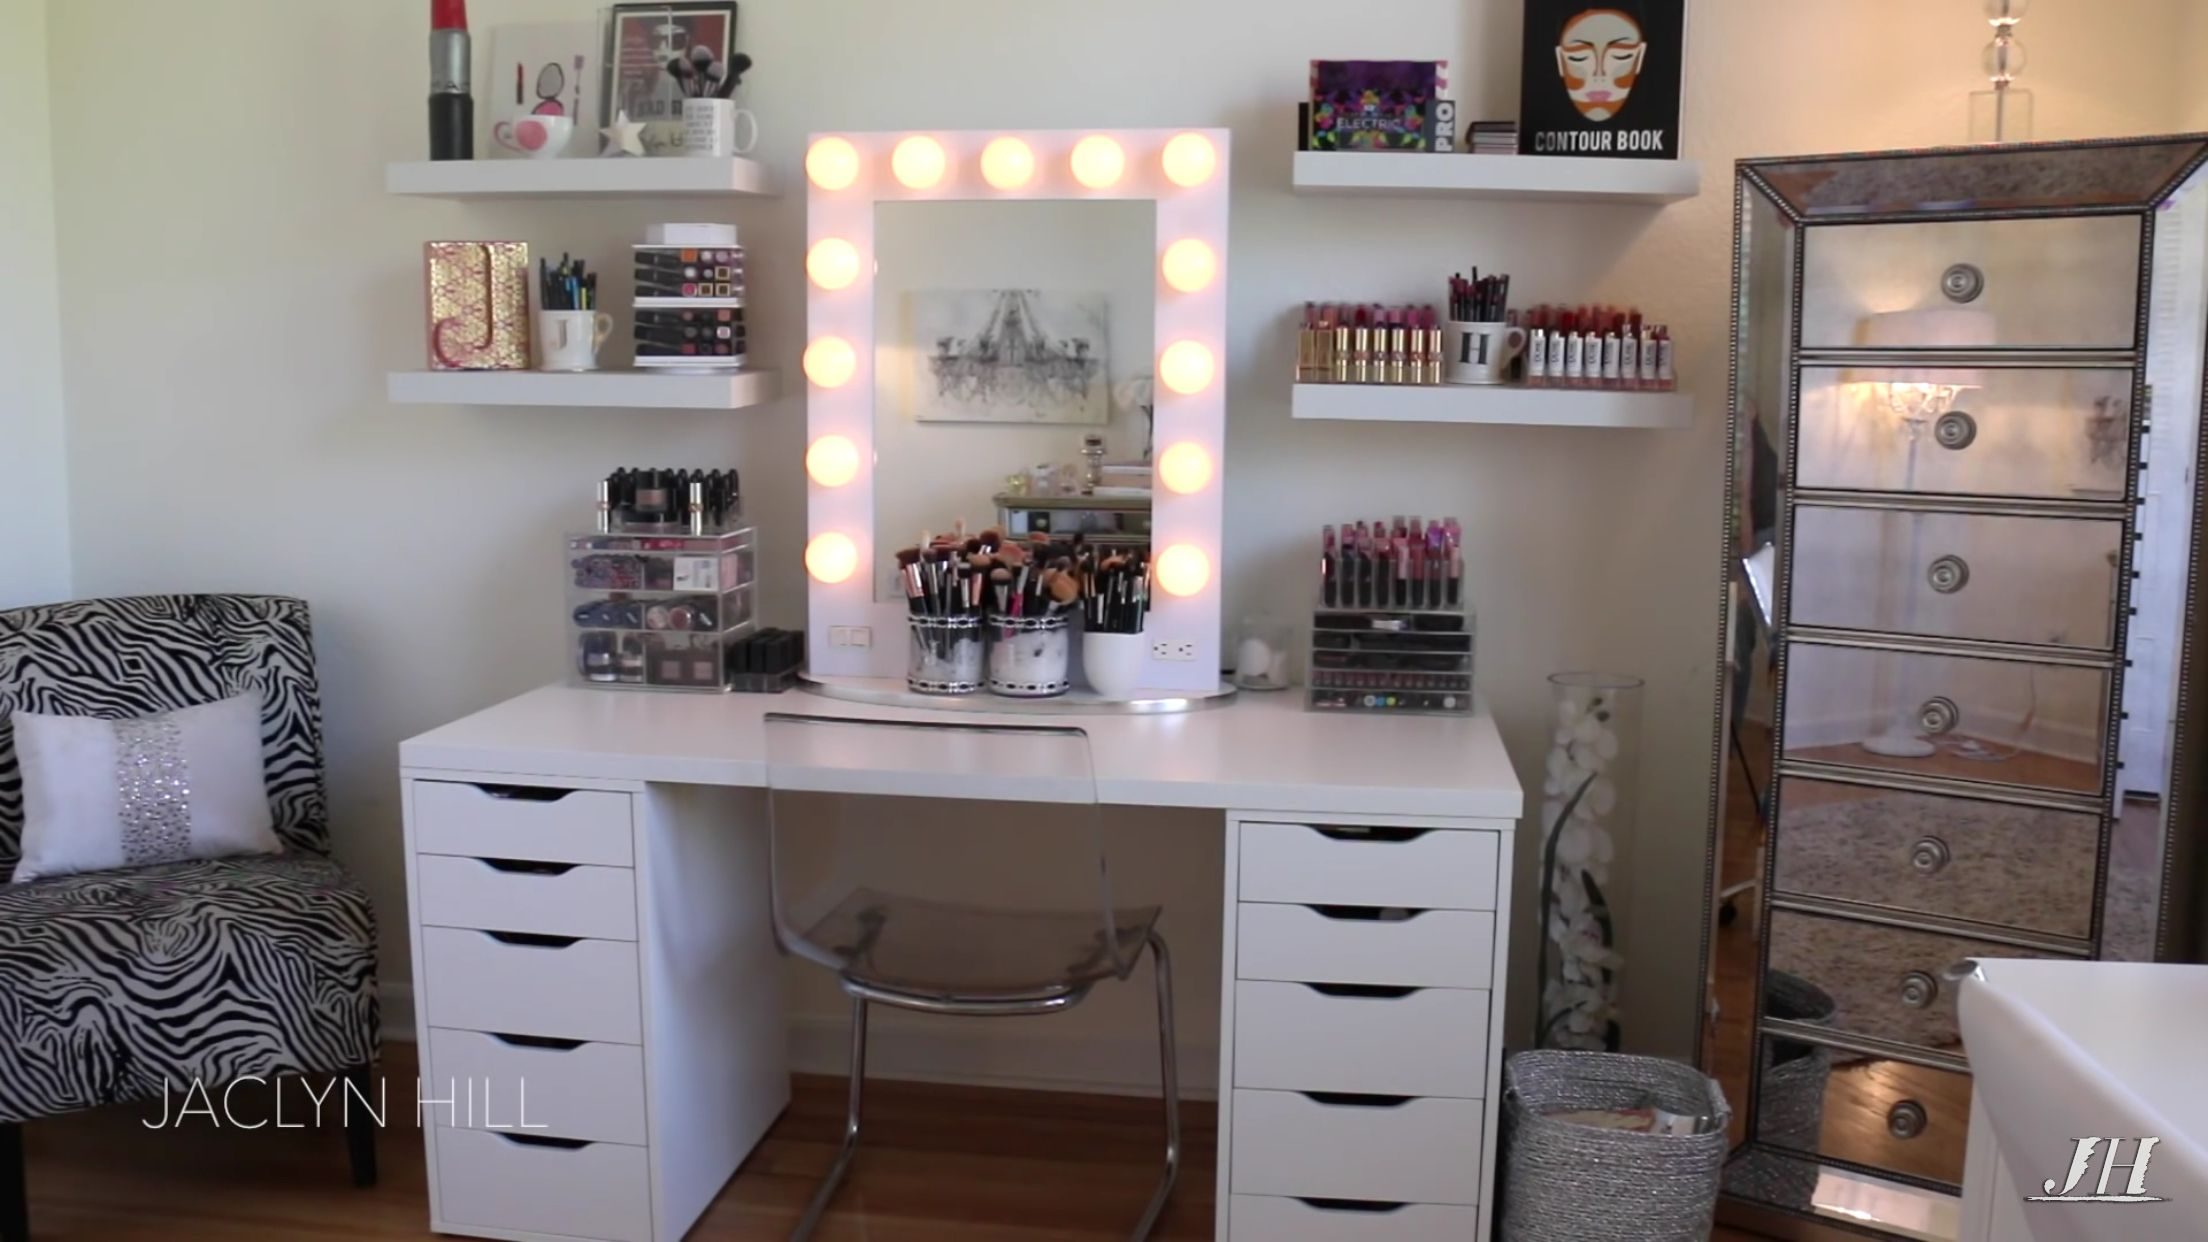 Jaclyn Hill's vanity White vanity desk, White vanity set